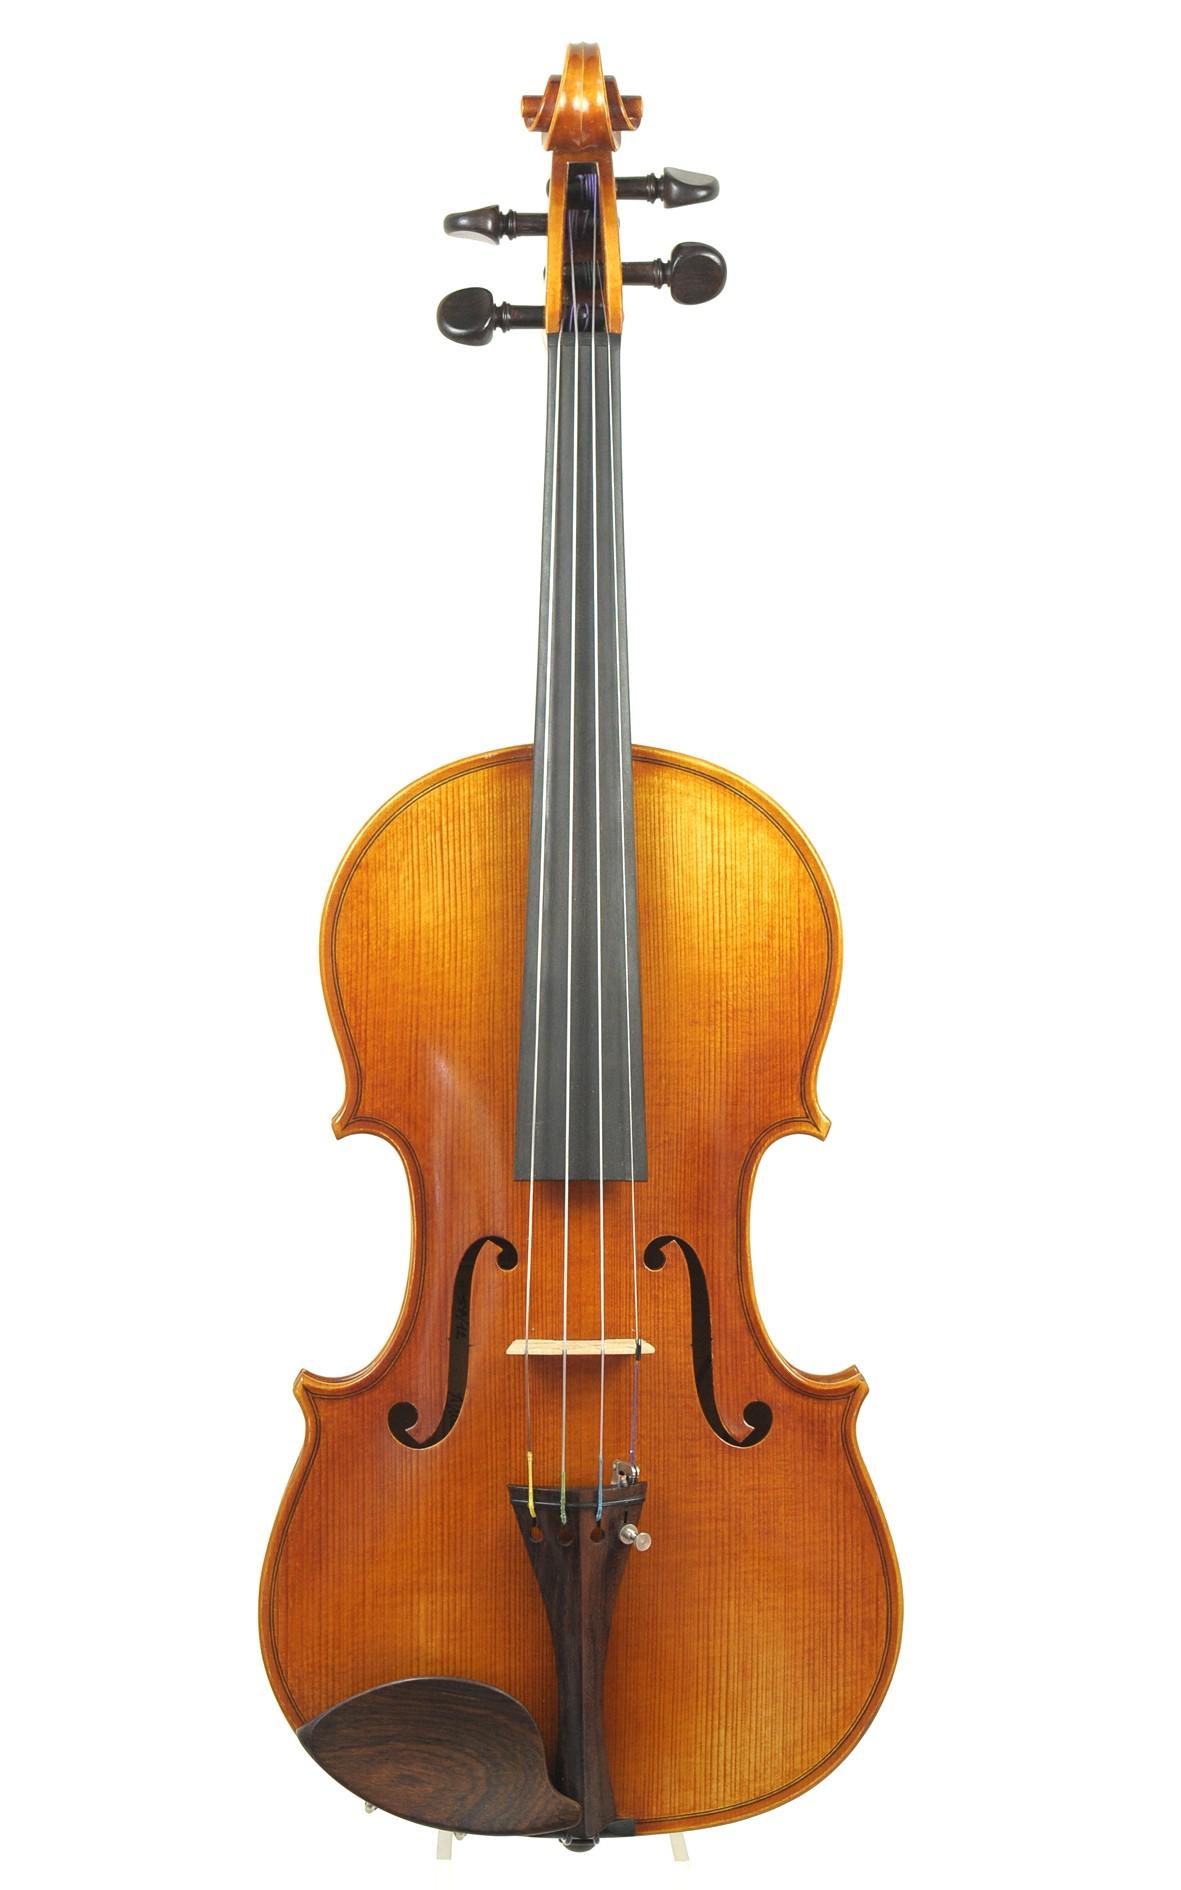 French violin, Alain Moinier, Mirecourt, 1992, No. 57 - top